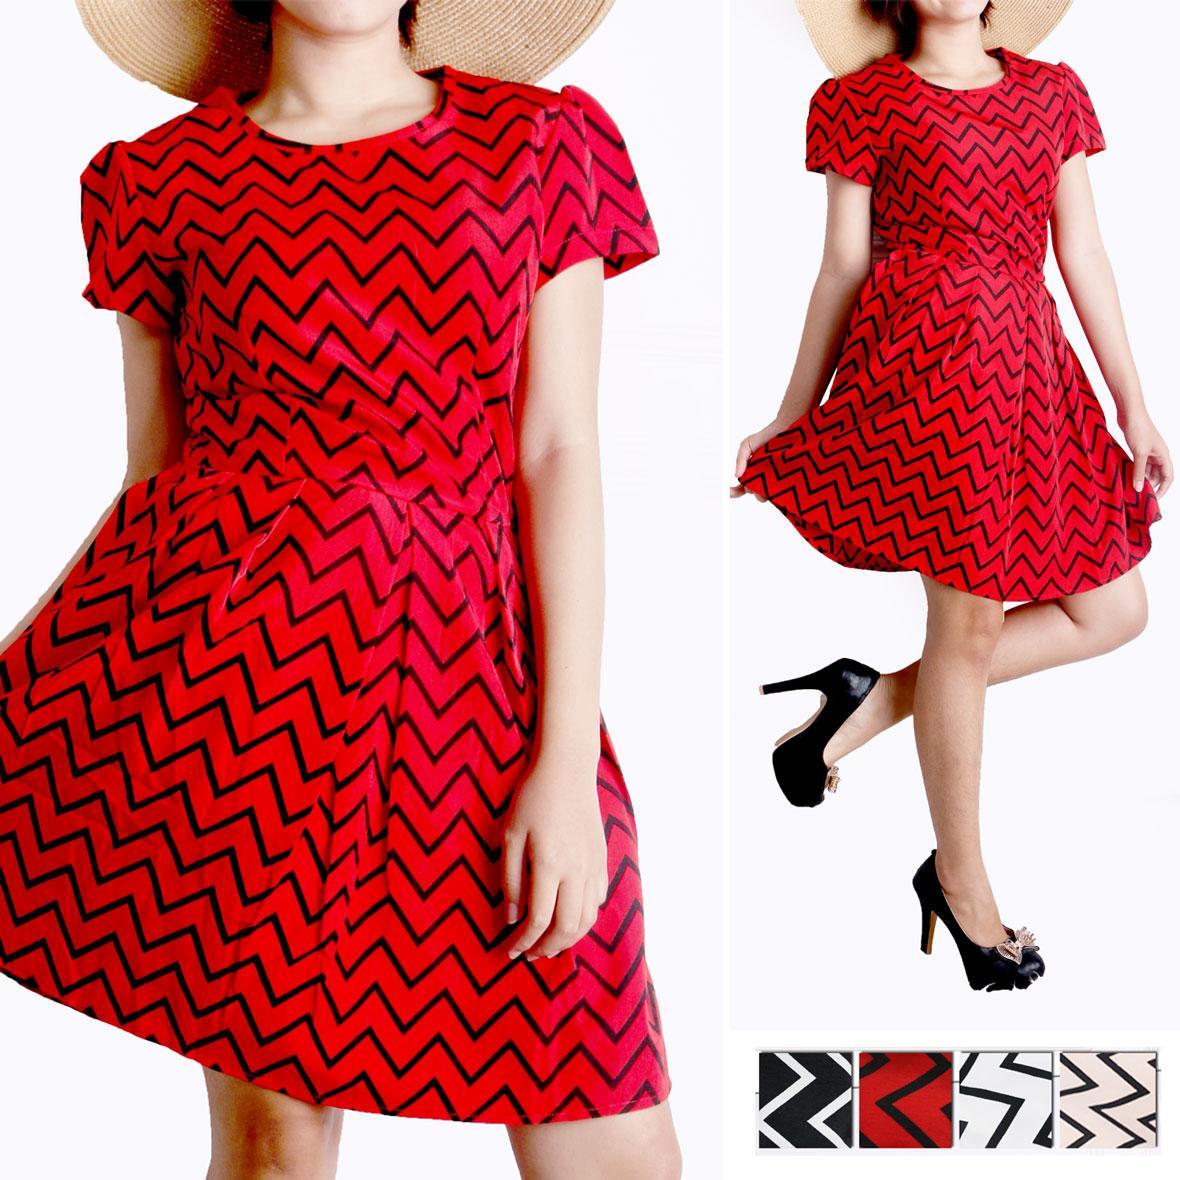 Oma Holley Fashion Berile Mini Dress Sleeveless 4 Warna-Size M